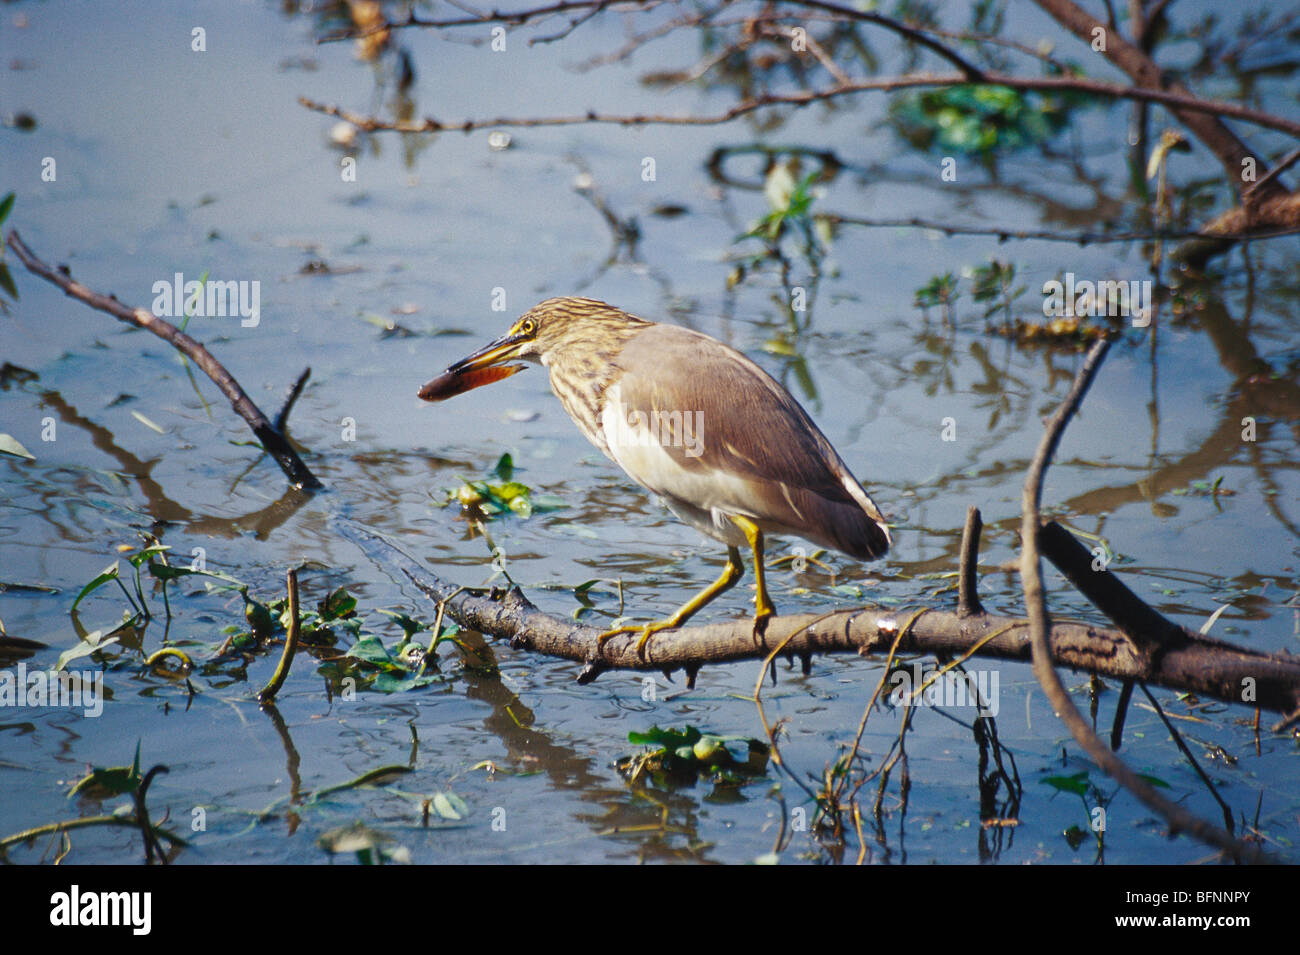 UGA 60171 : Birds ; Paddy bird Pond Heron ardeola grayii with feed ; Bharatpur bird sanctuary ; Rajasthan ; India - Stock Image